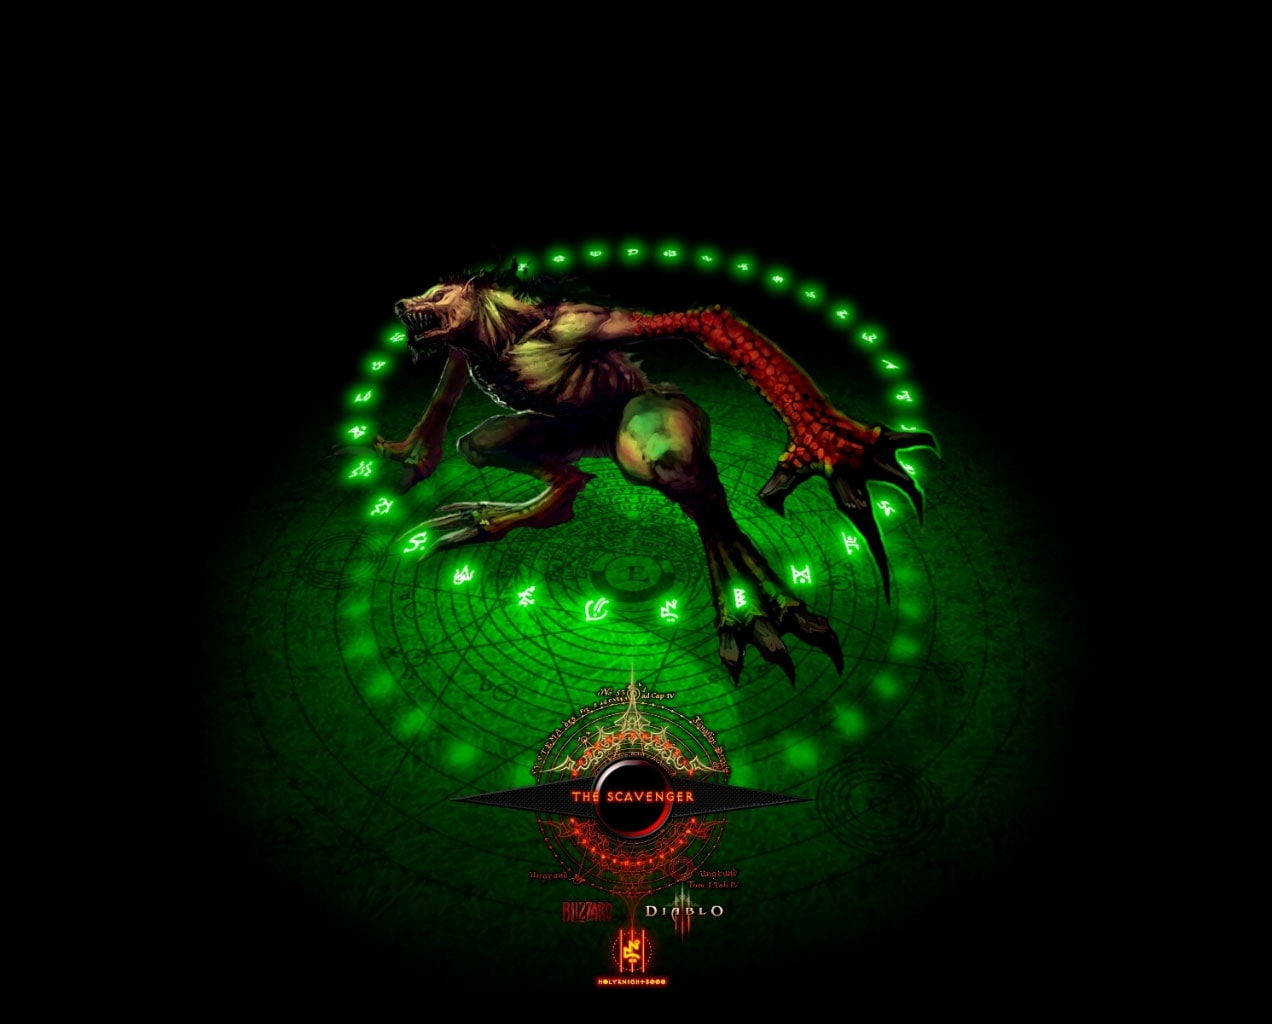 Diablo 3 Windows 7 Theme